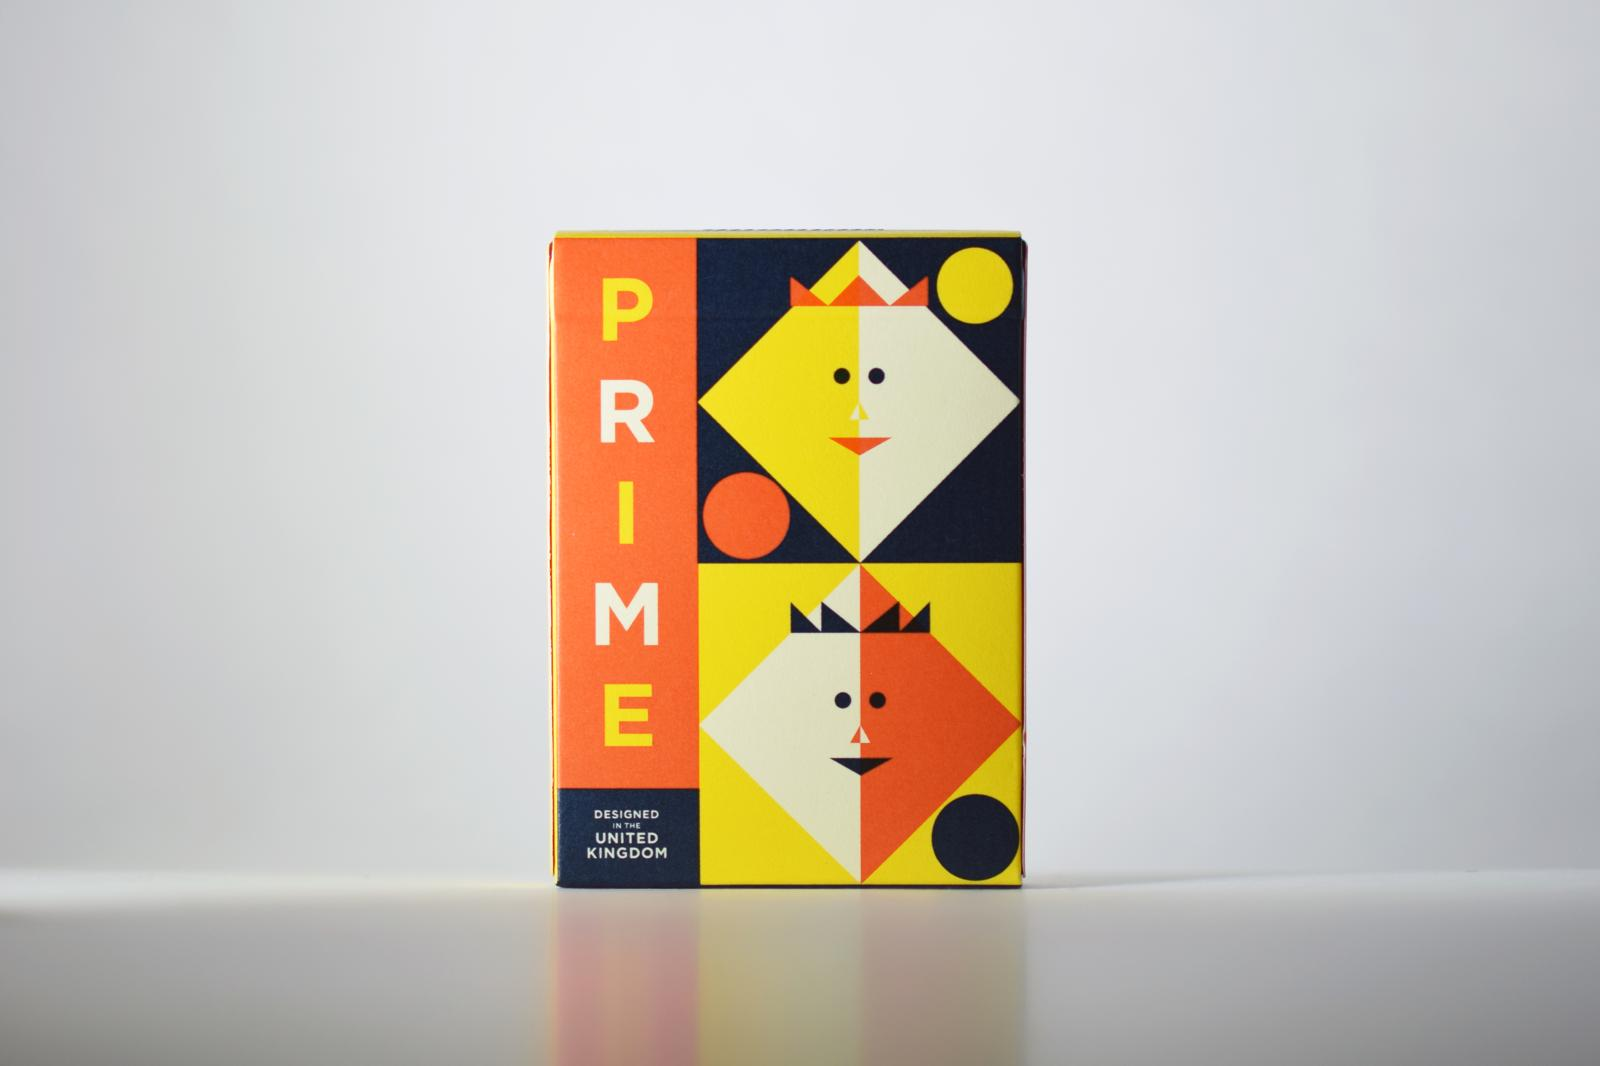 PrimeFront